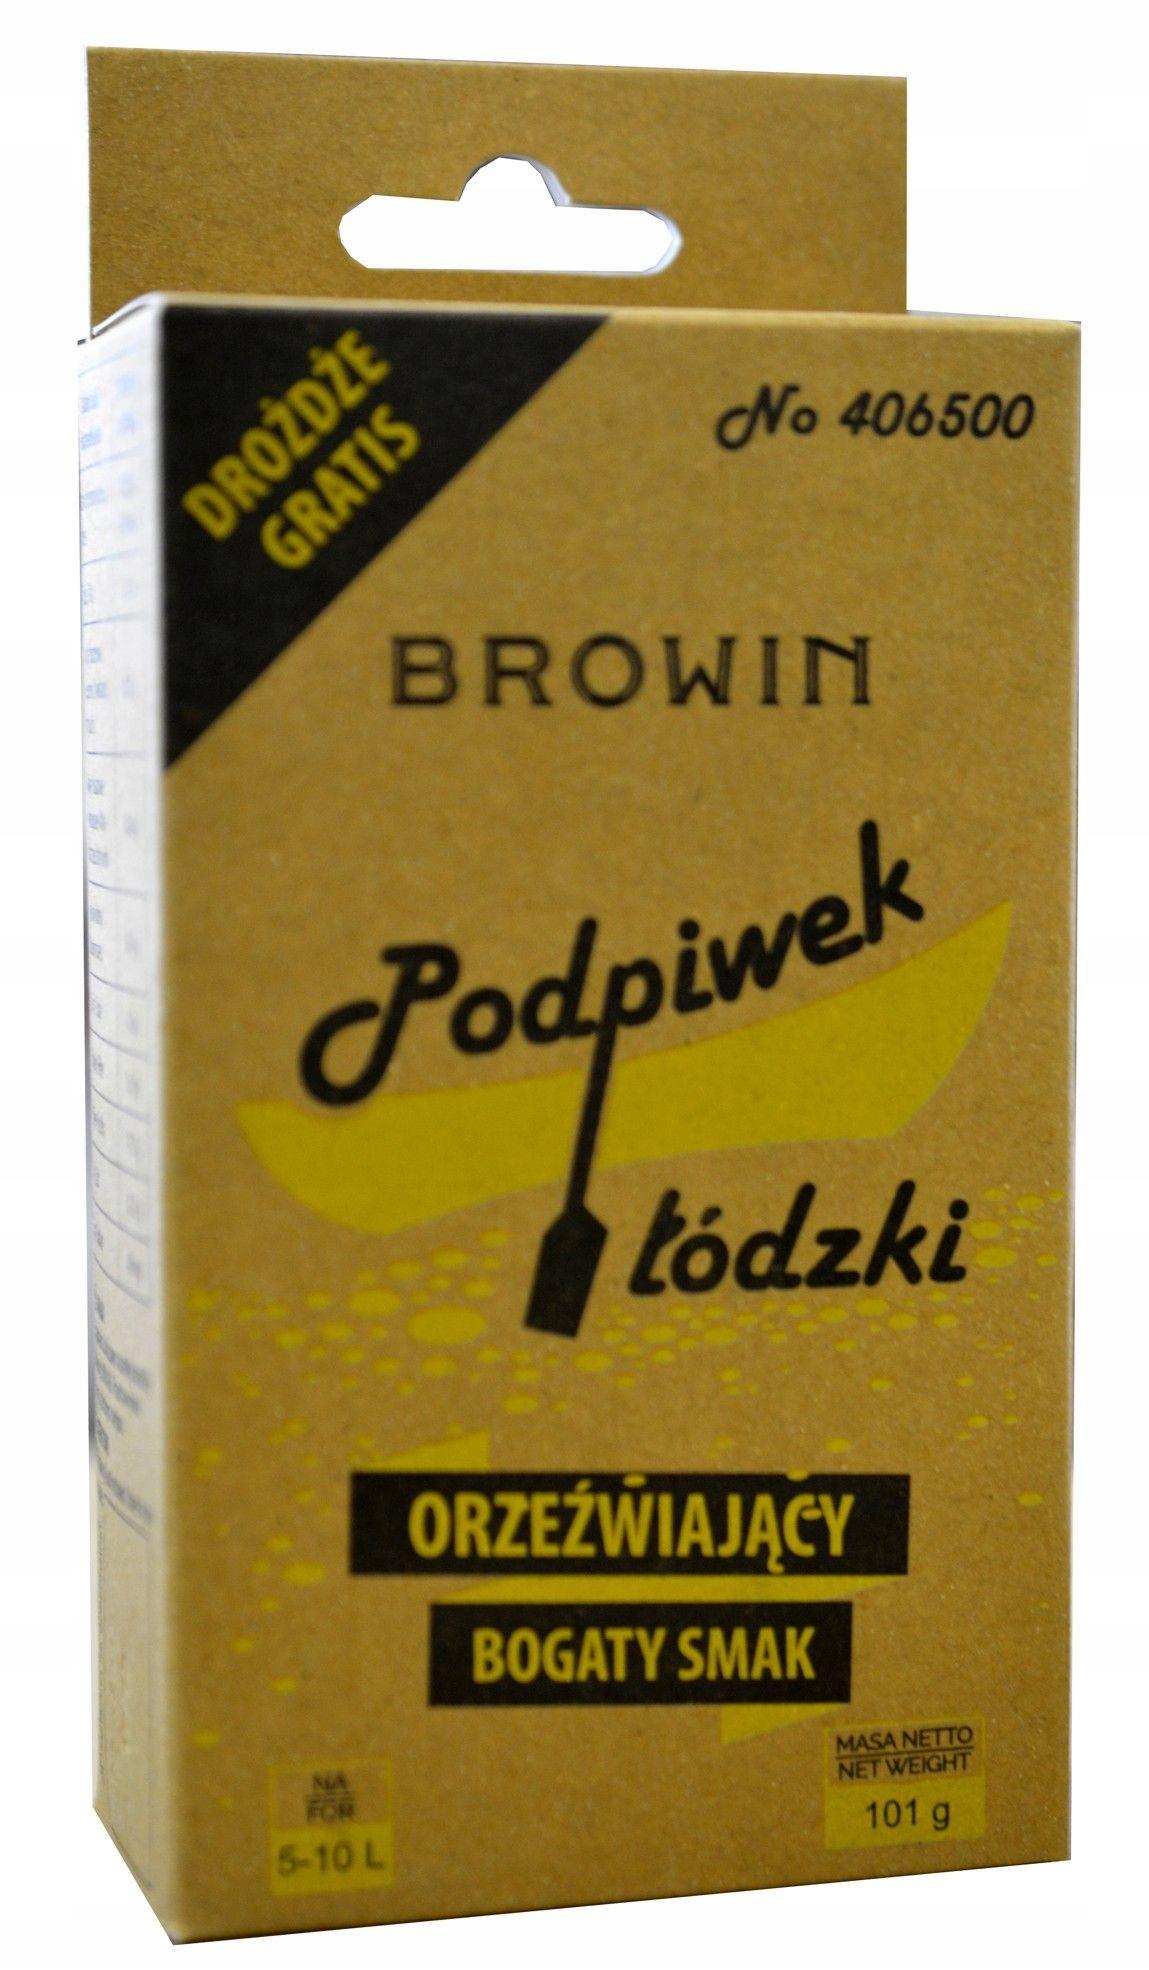 подставка ЛОДЗИНСКИЙ 100г + дрожжи BROWIN